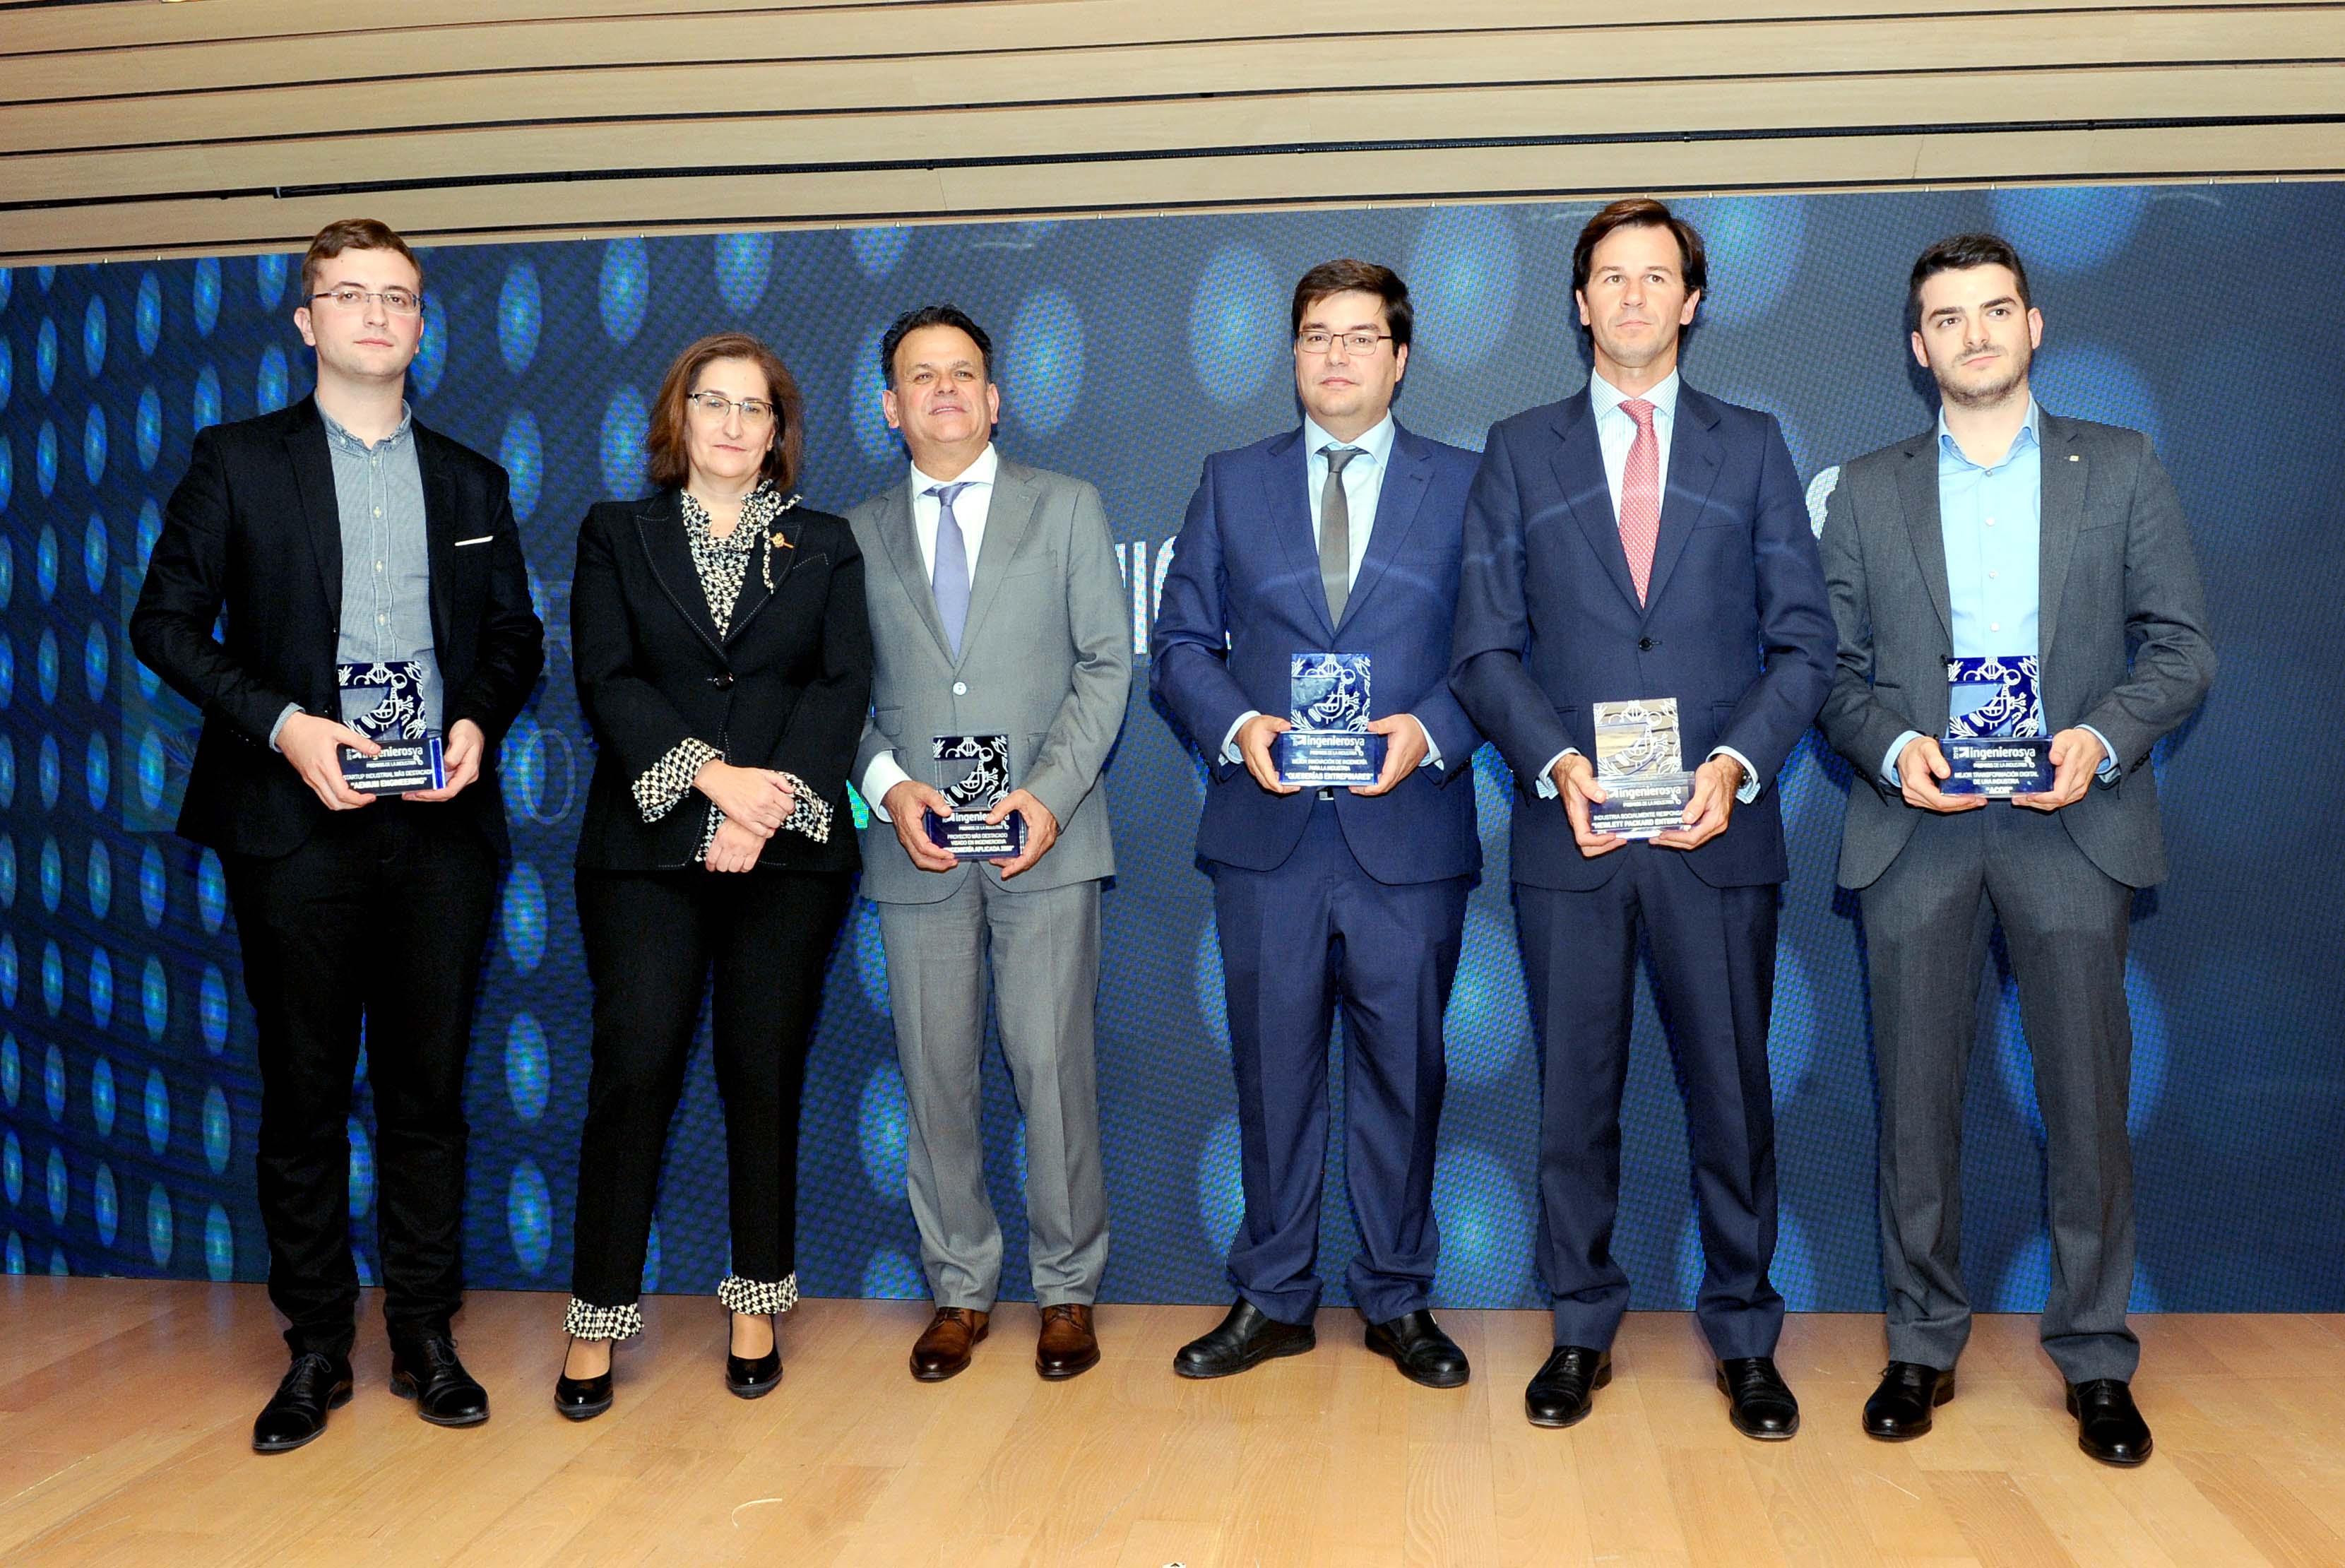 III Premios de la Industria de ingenierosVA - ganadores